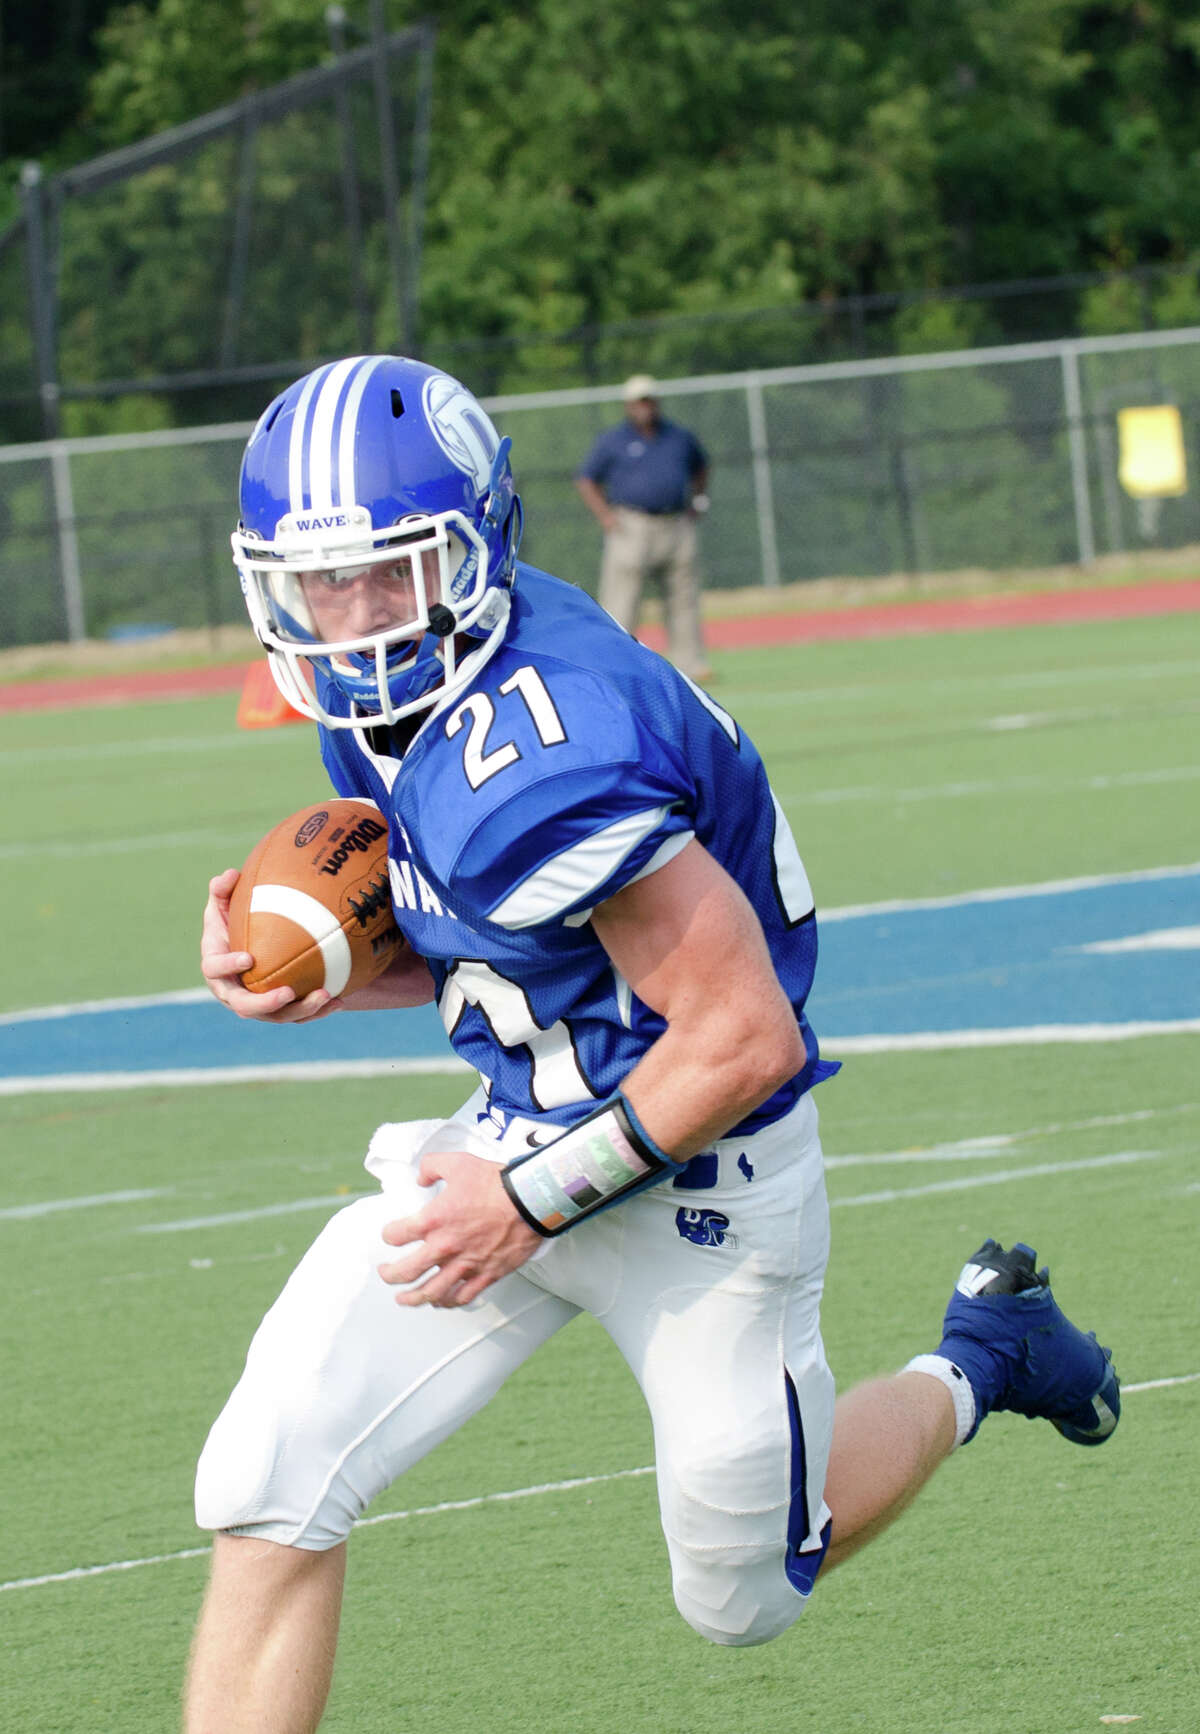 Darien's Nicholas Lombardo (21) carries the ball during the football game against Hillhouse High School at Darien High School in Darien, Conn. on Thursday, Sept. 12, 2013.